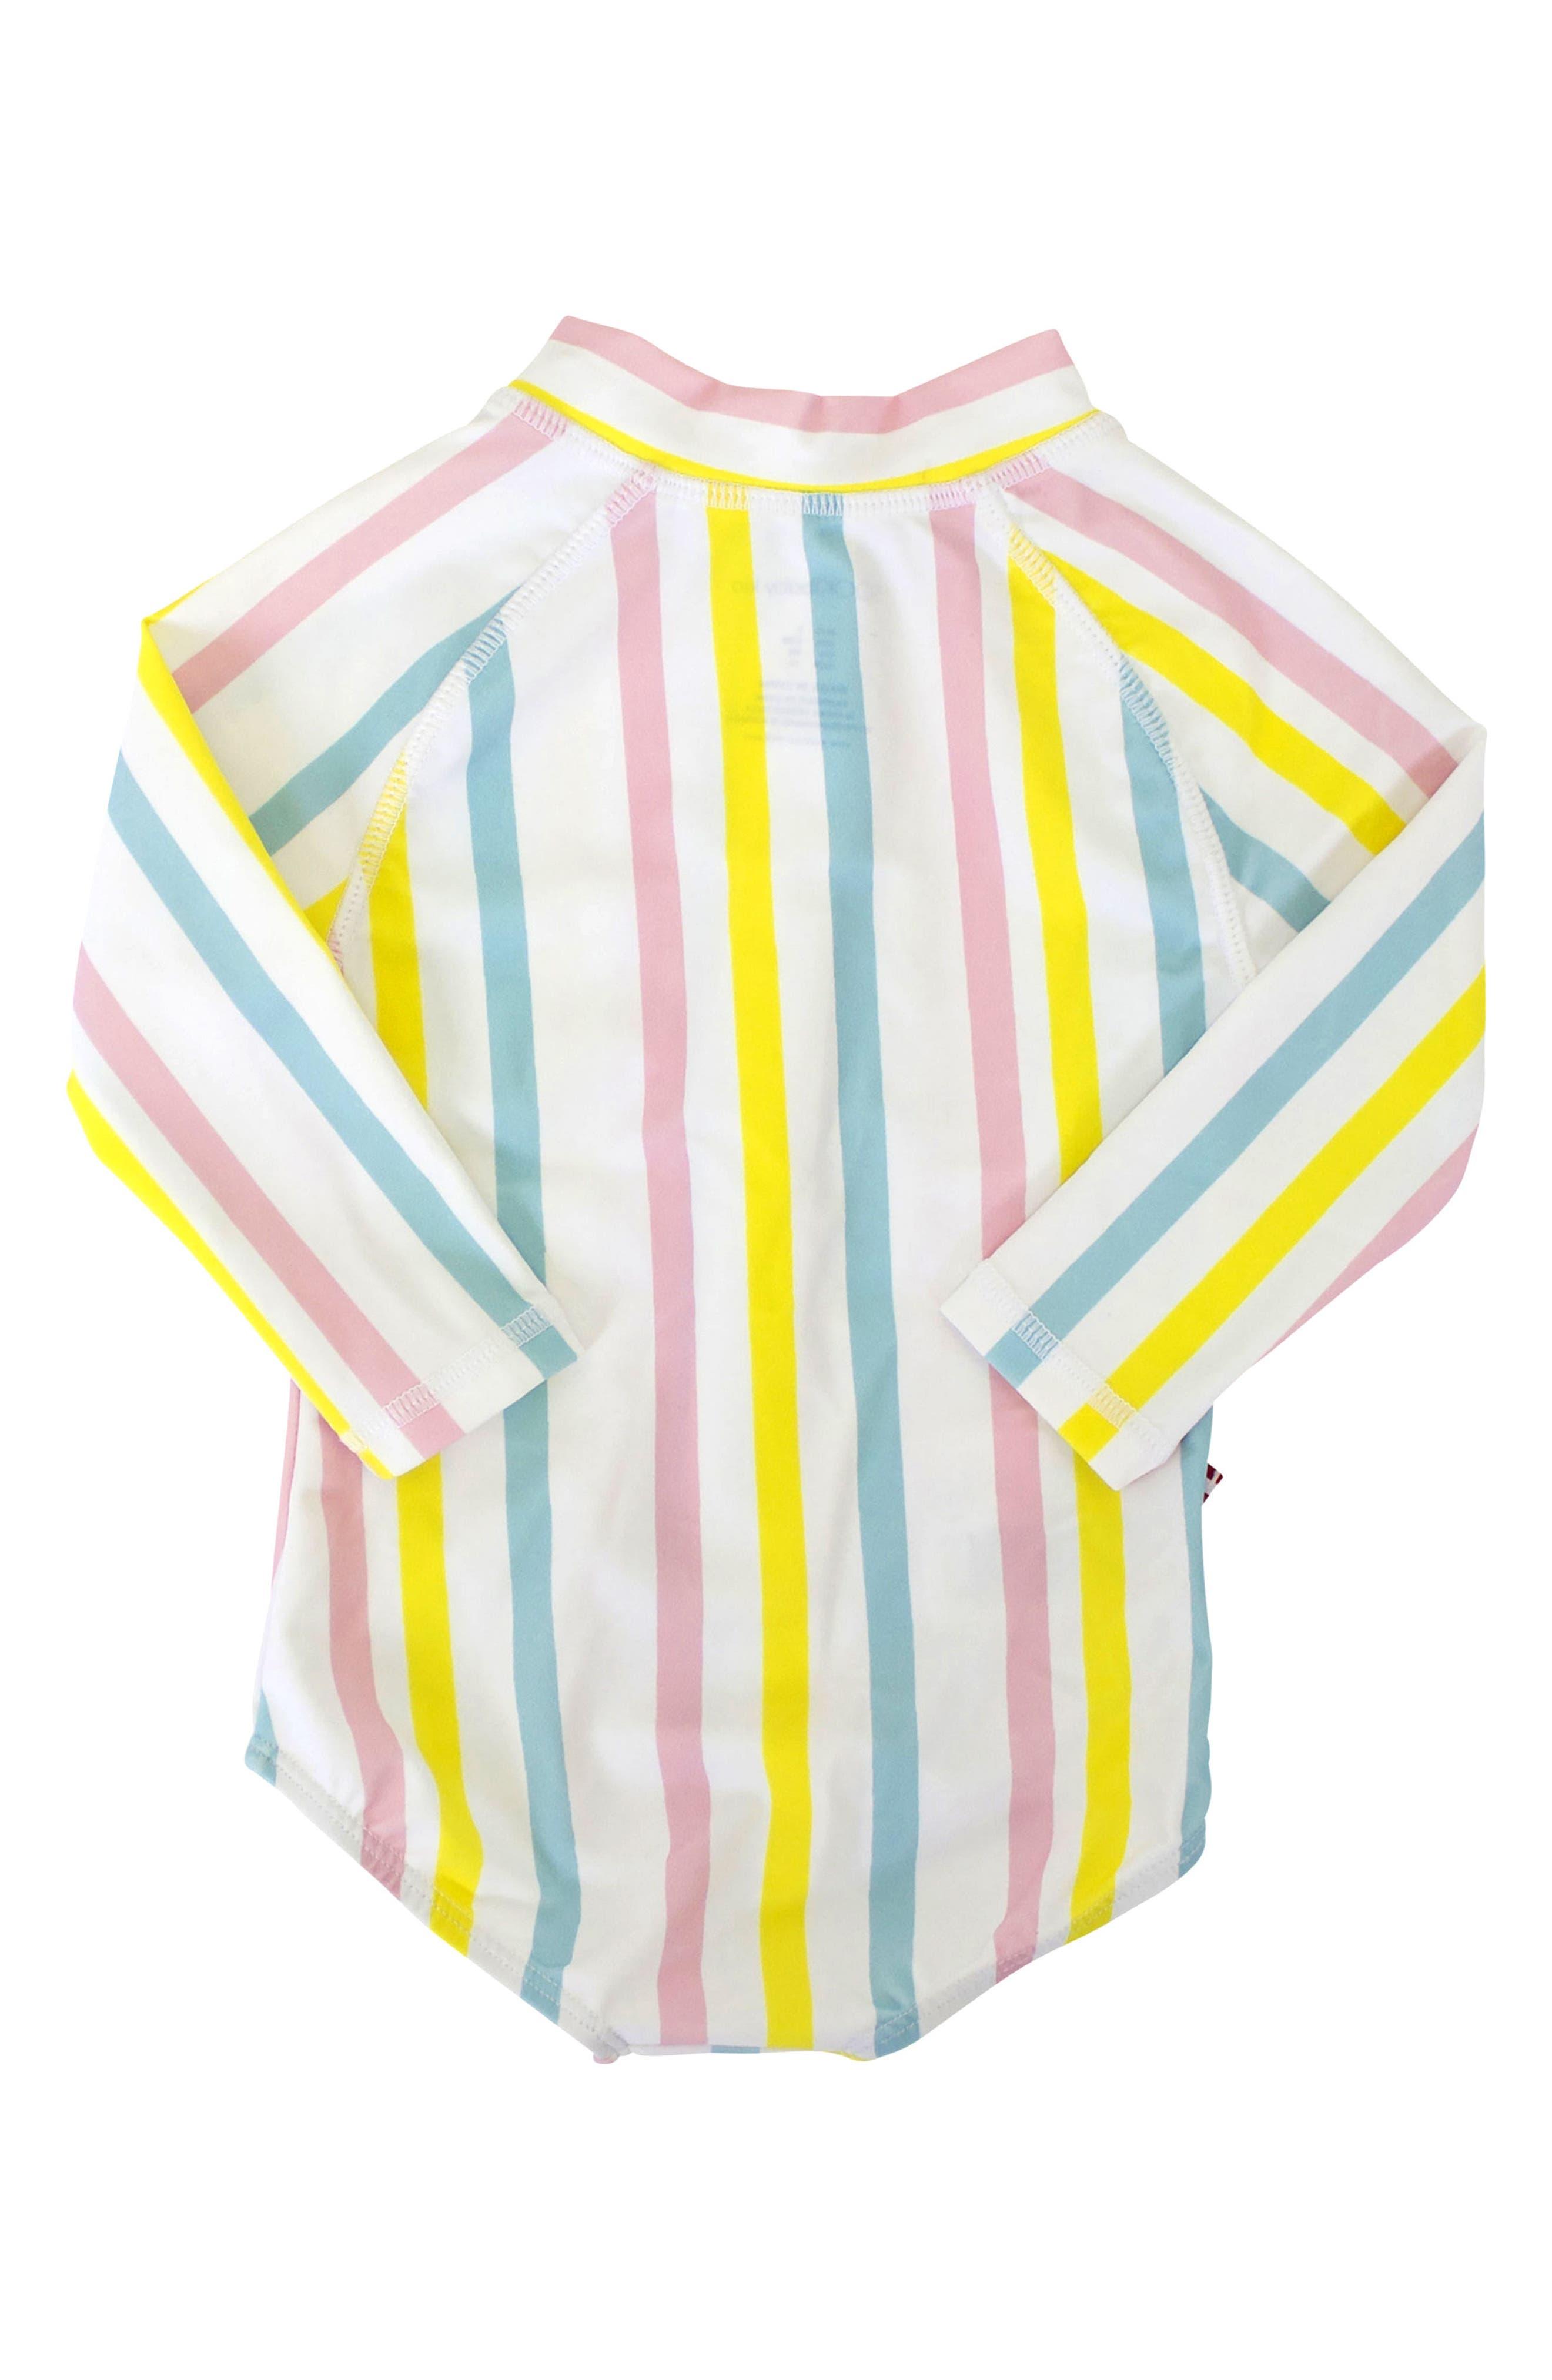 Stripe One-Piece Rashguard Swimsuit,                             Alternate thumbnail 2, color,                             700